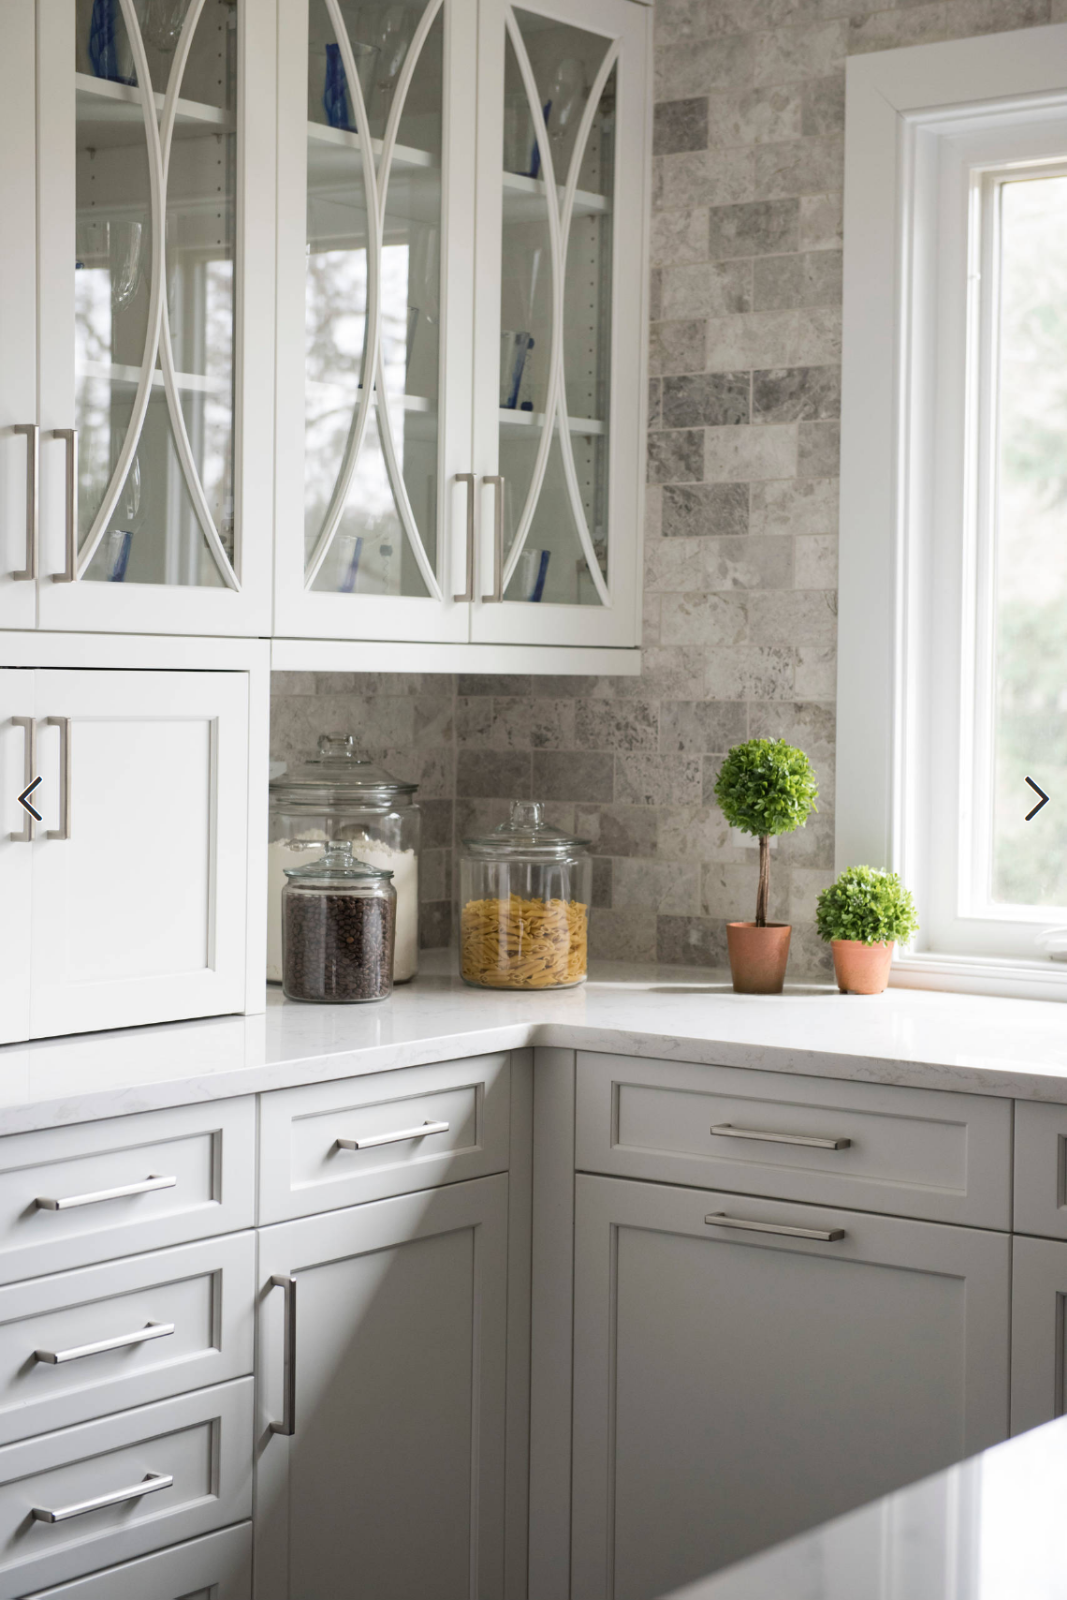 Stainless Steel Kitchen Cabinet Handles Square Door Knobs Cupboard Drawer Pulls 6